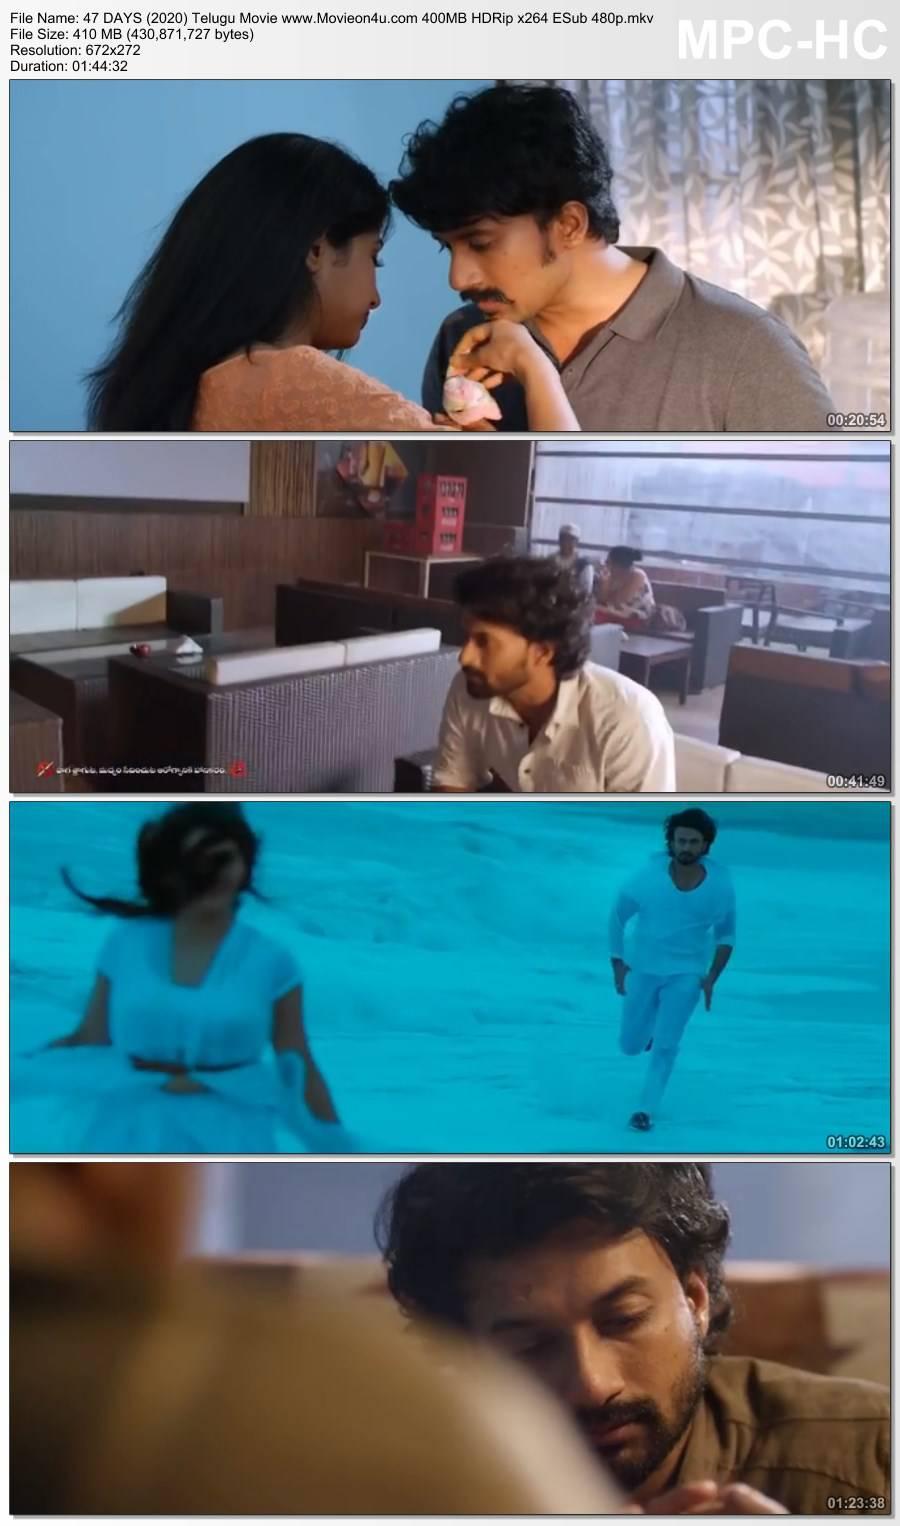 47 DAYS (2020) Telugu Movie 400MB HDRip x264 ESub 480p Download HD